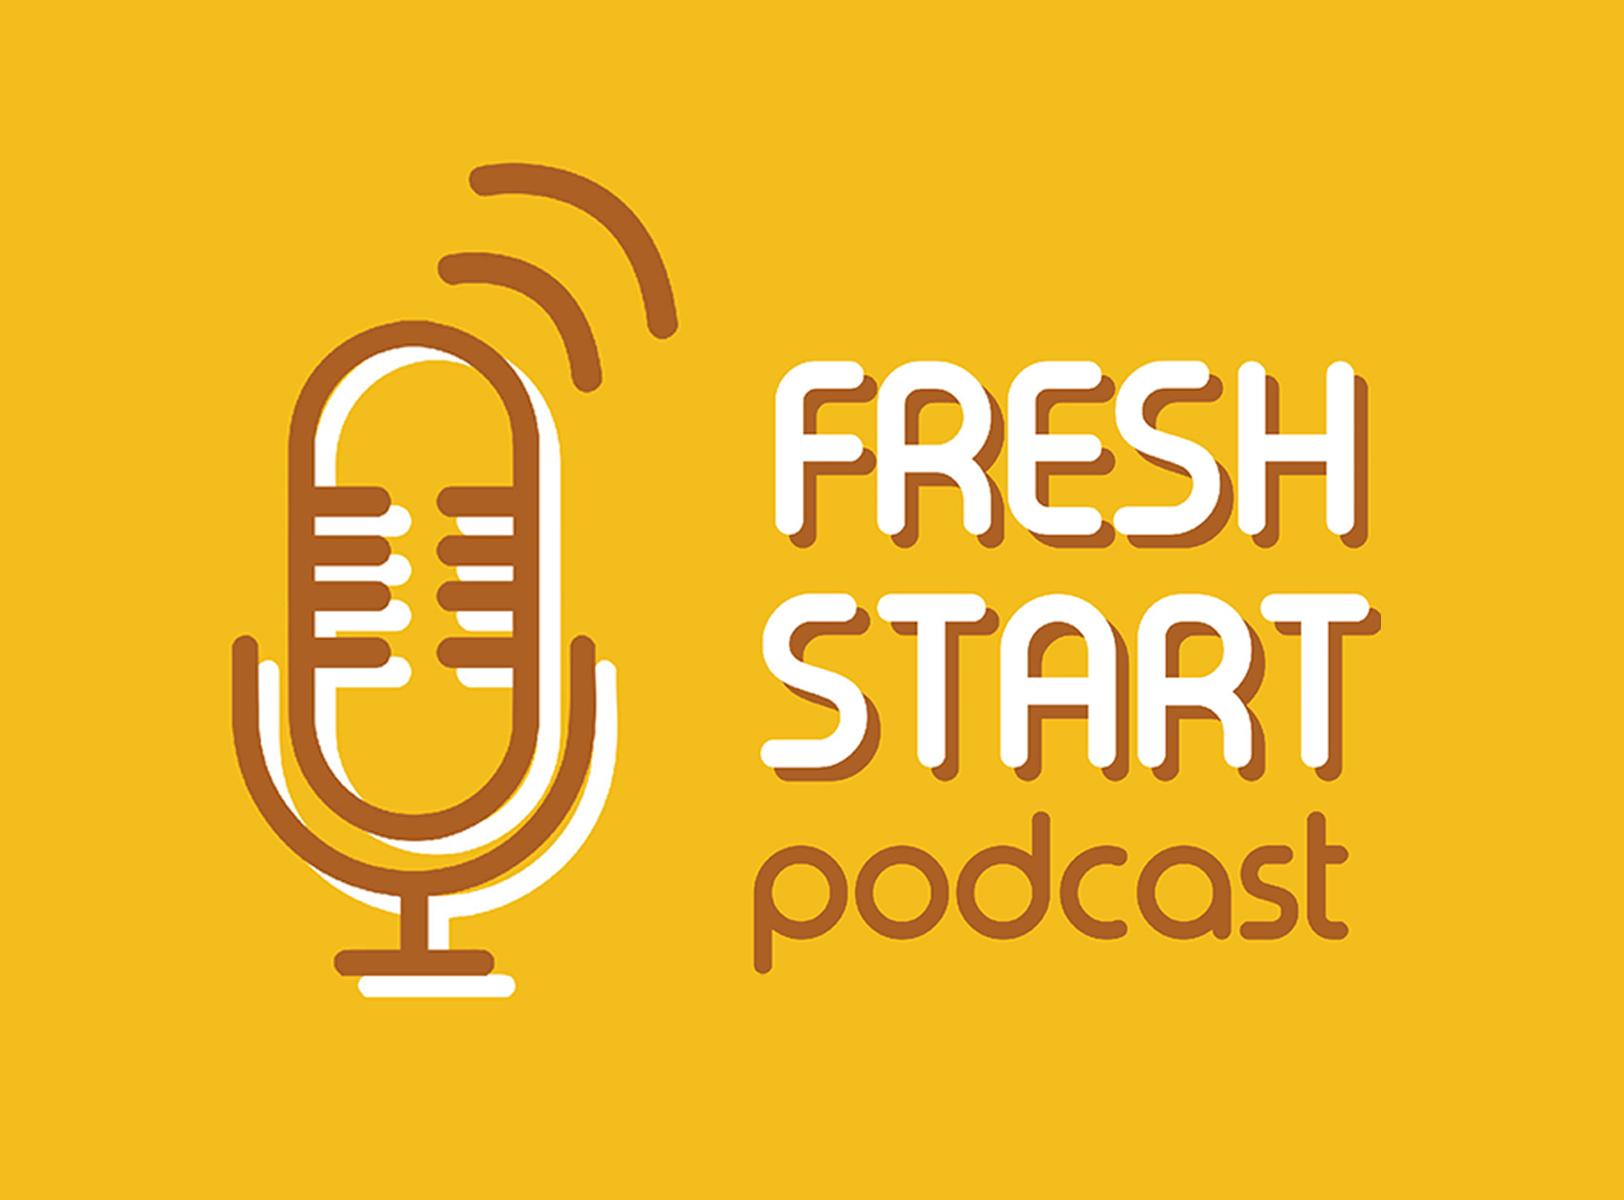 Fresh Start: Podcast News (9/6/2019 Fri.)